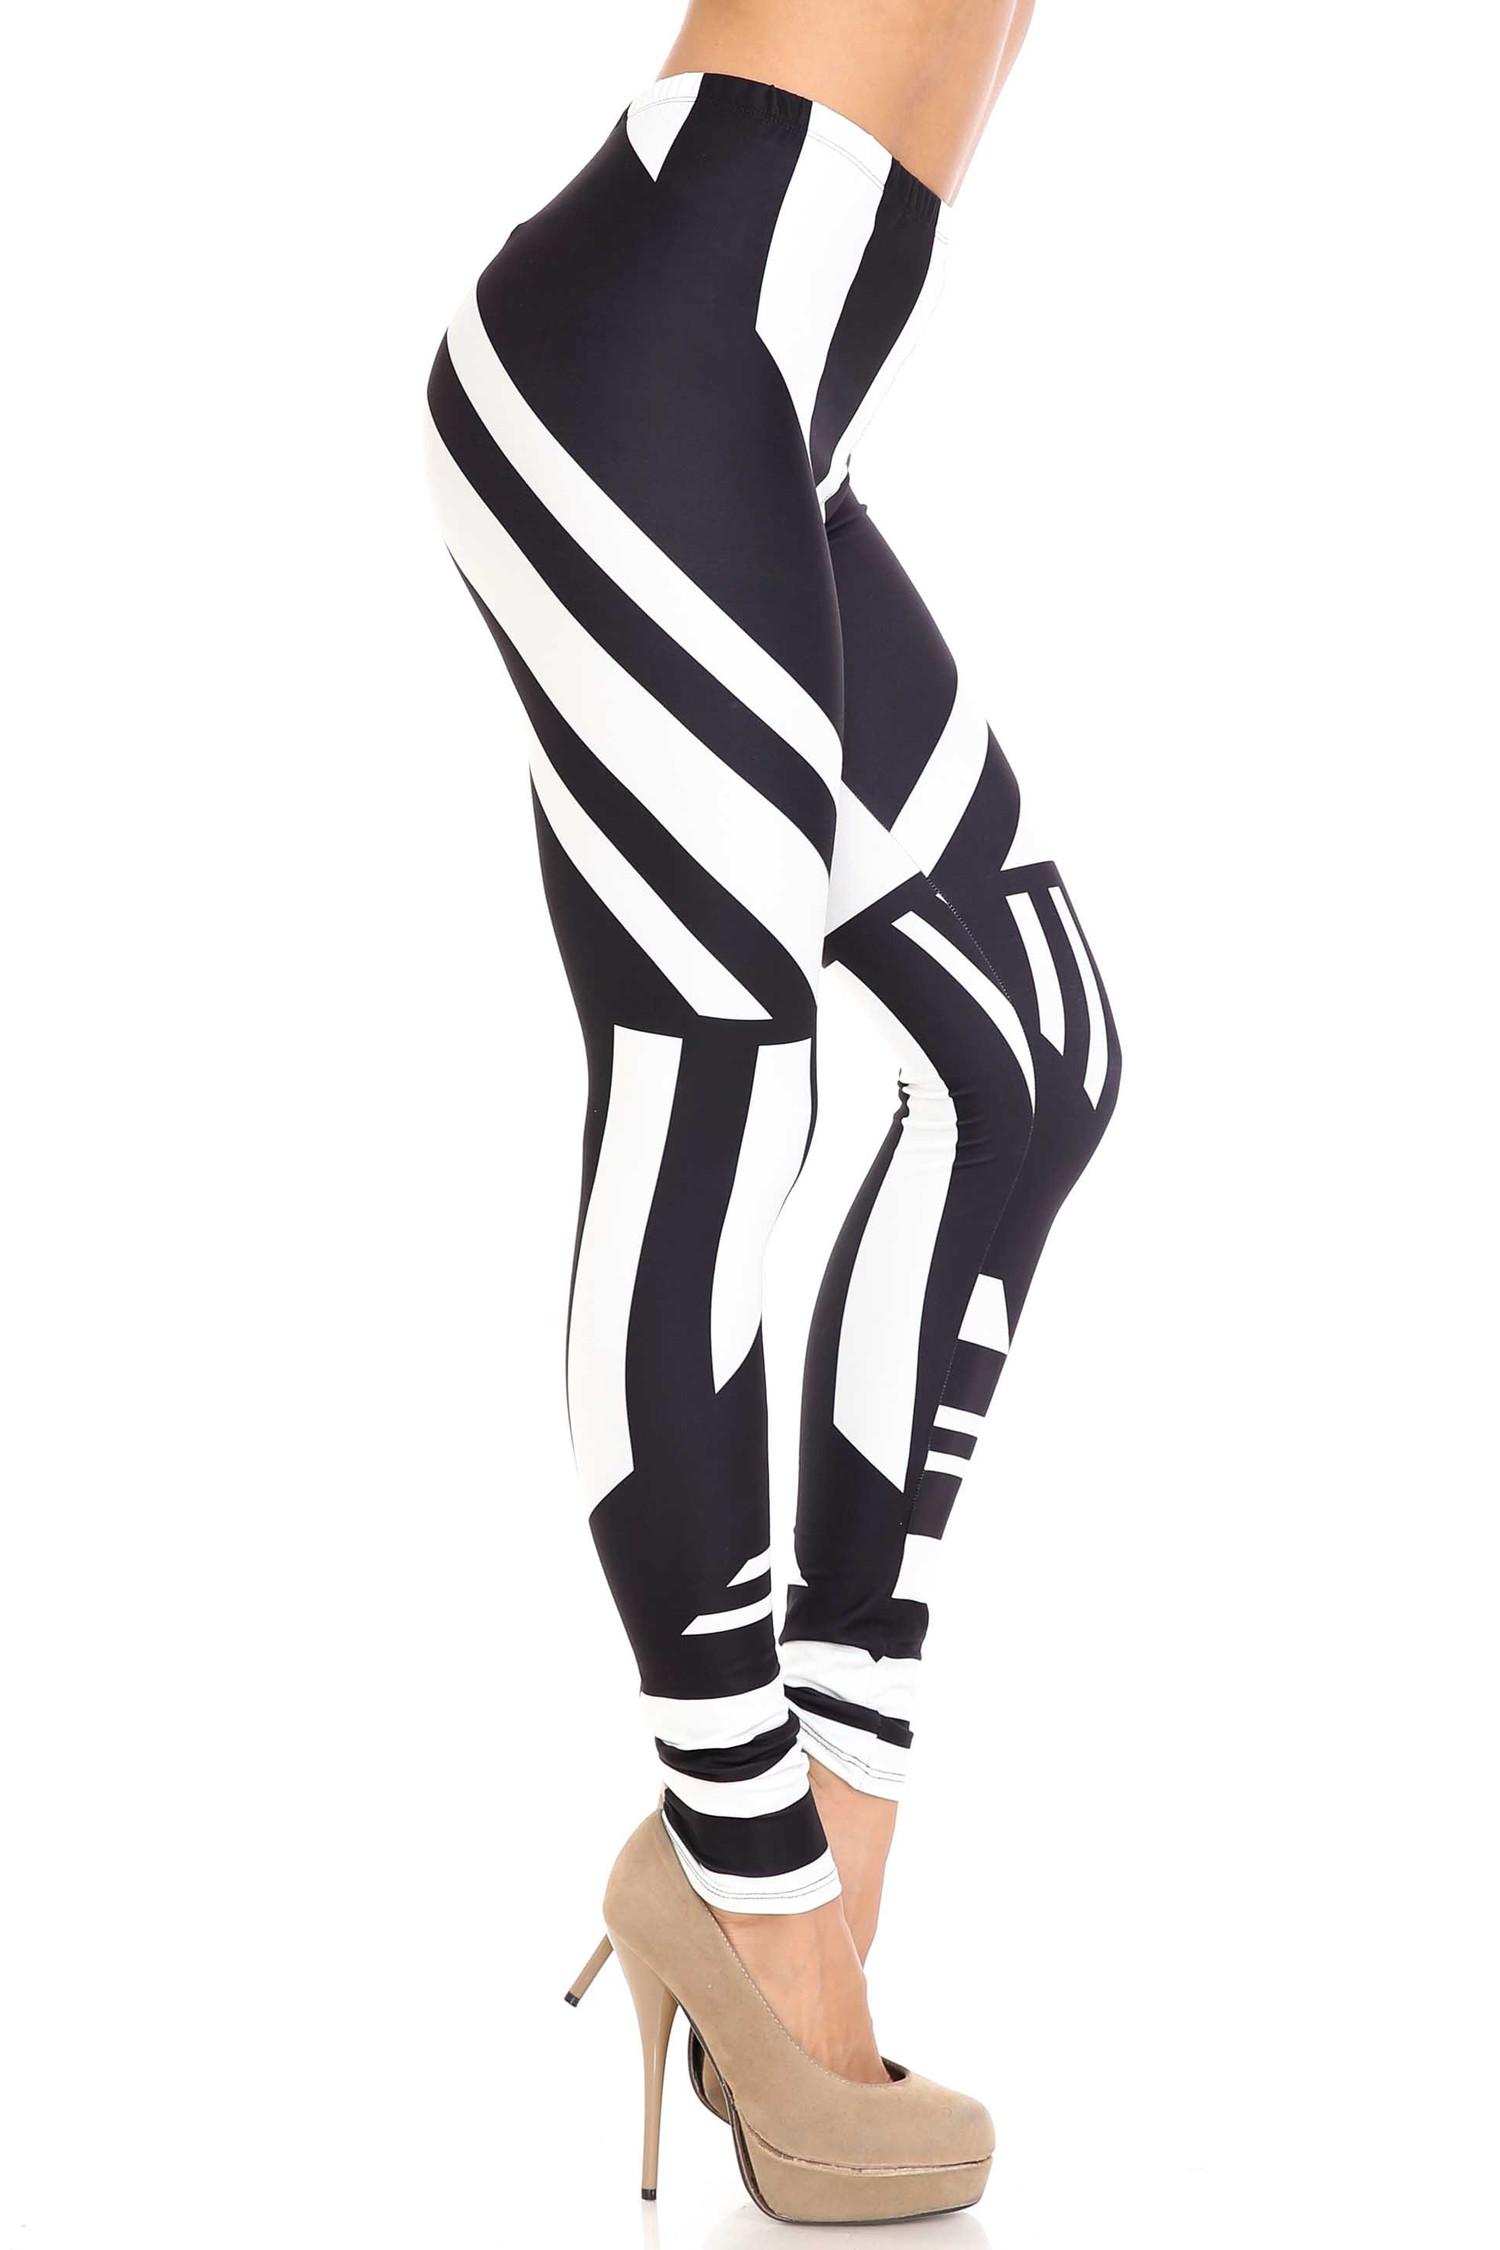 Creamy Soft Body Flatter Lines Leggings - USA Fashion™